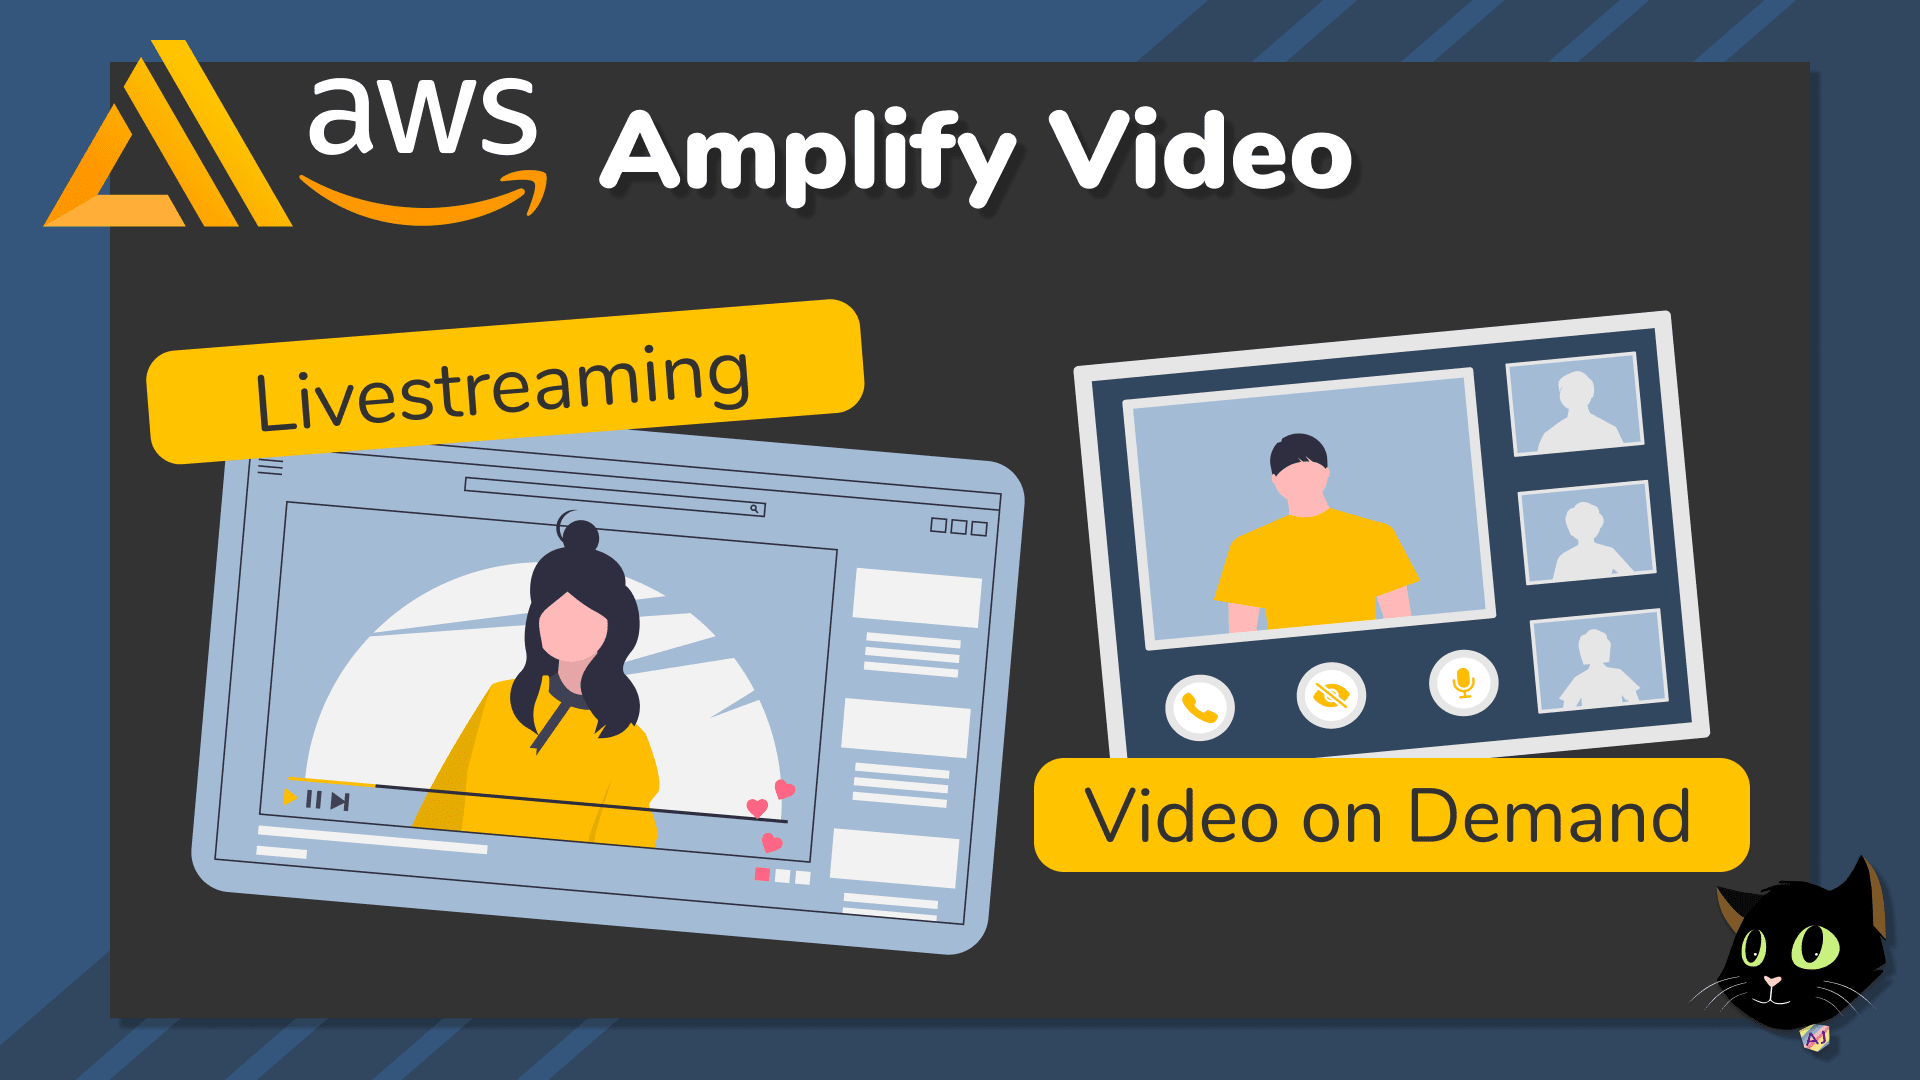 AWS Amplify Video